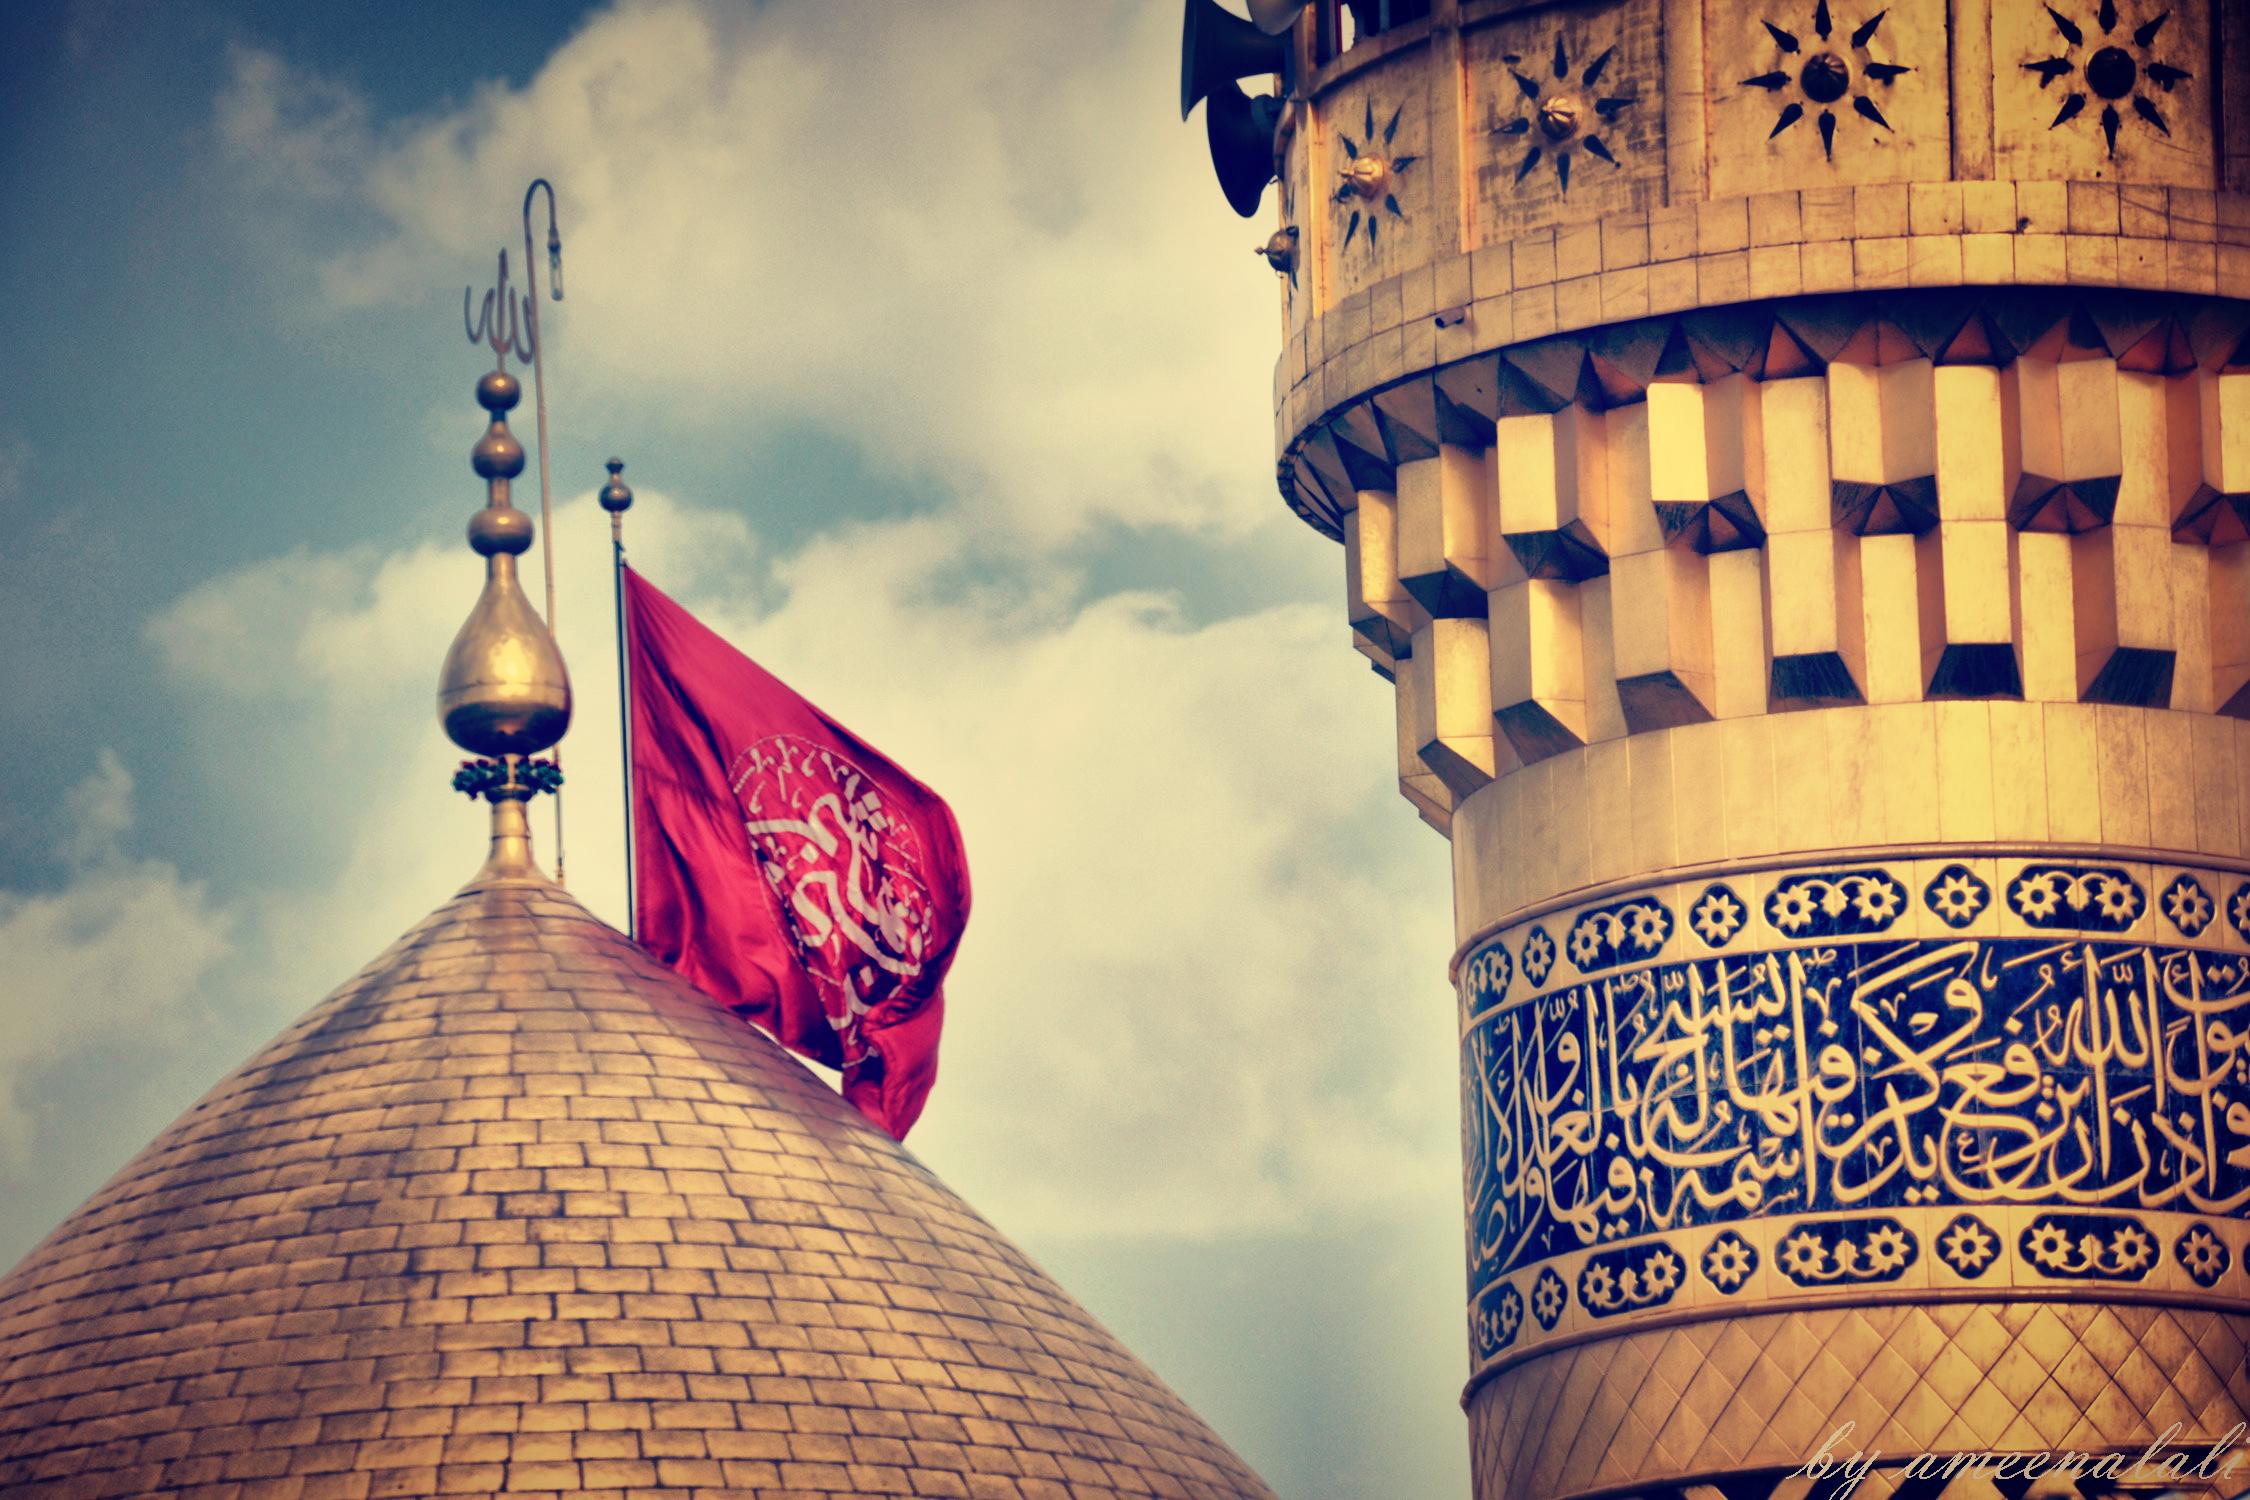 عکس اچ دی حرم امام حسین